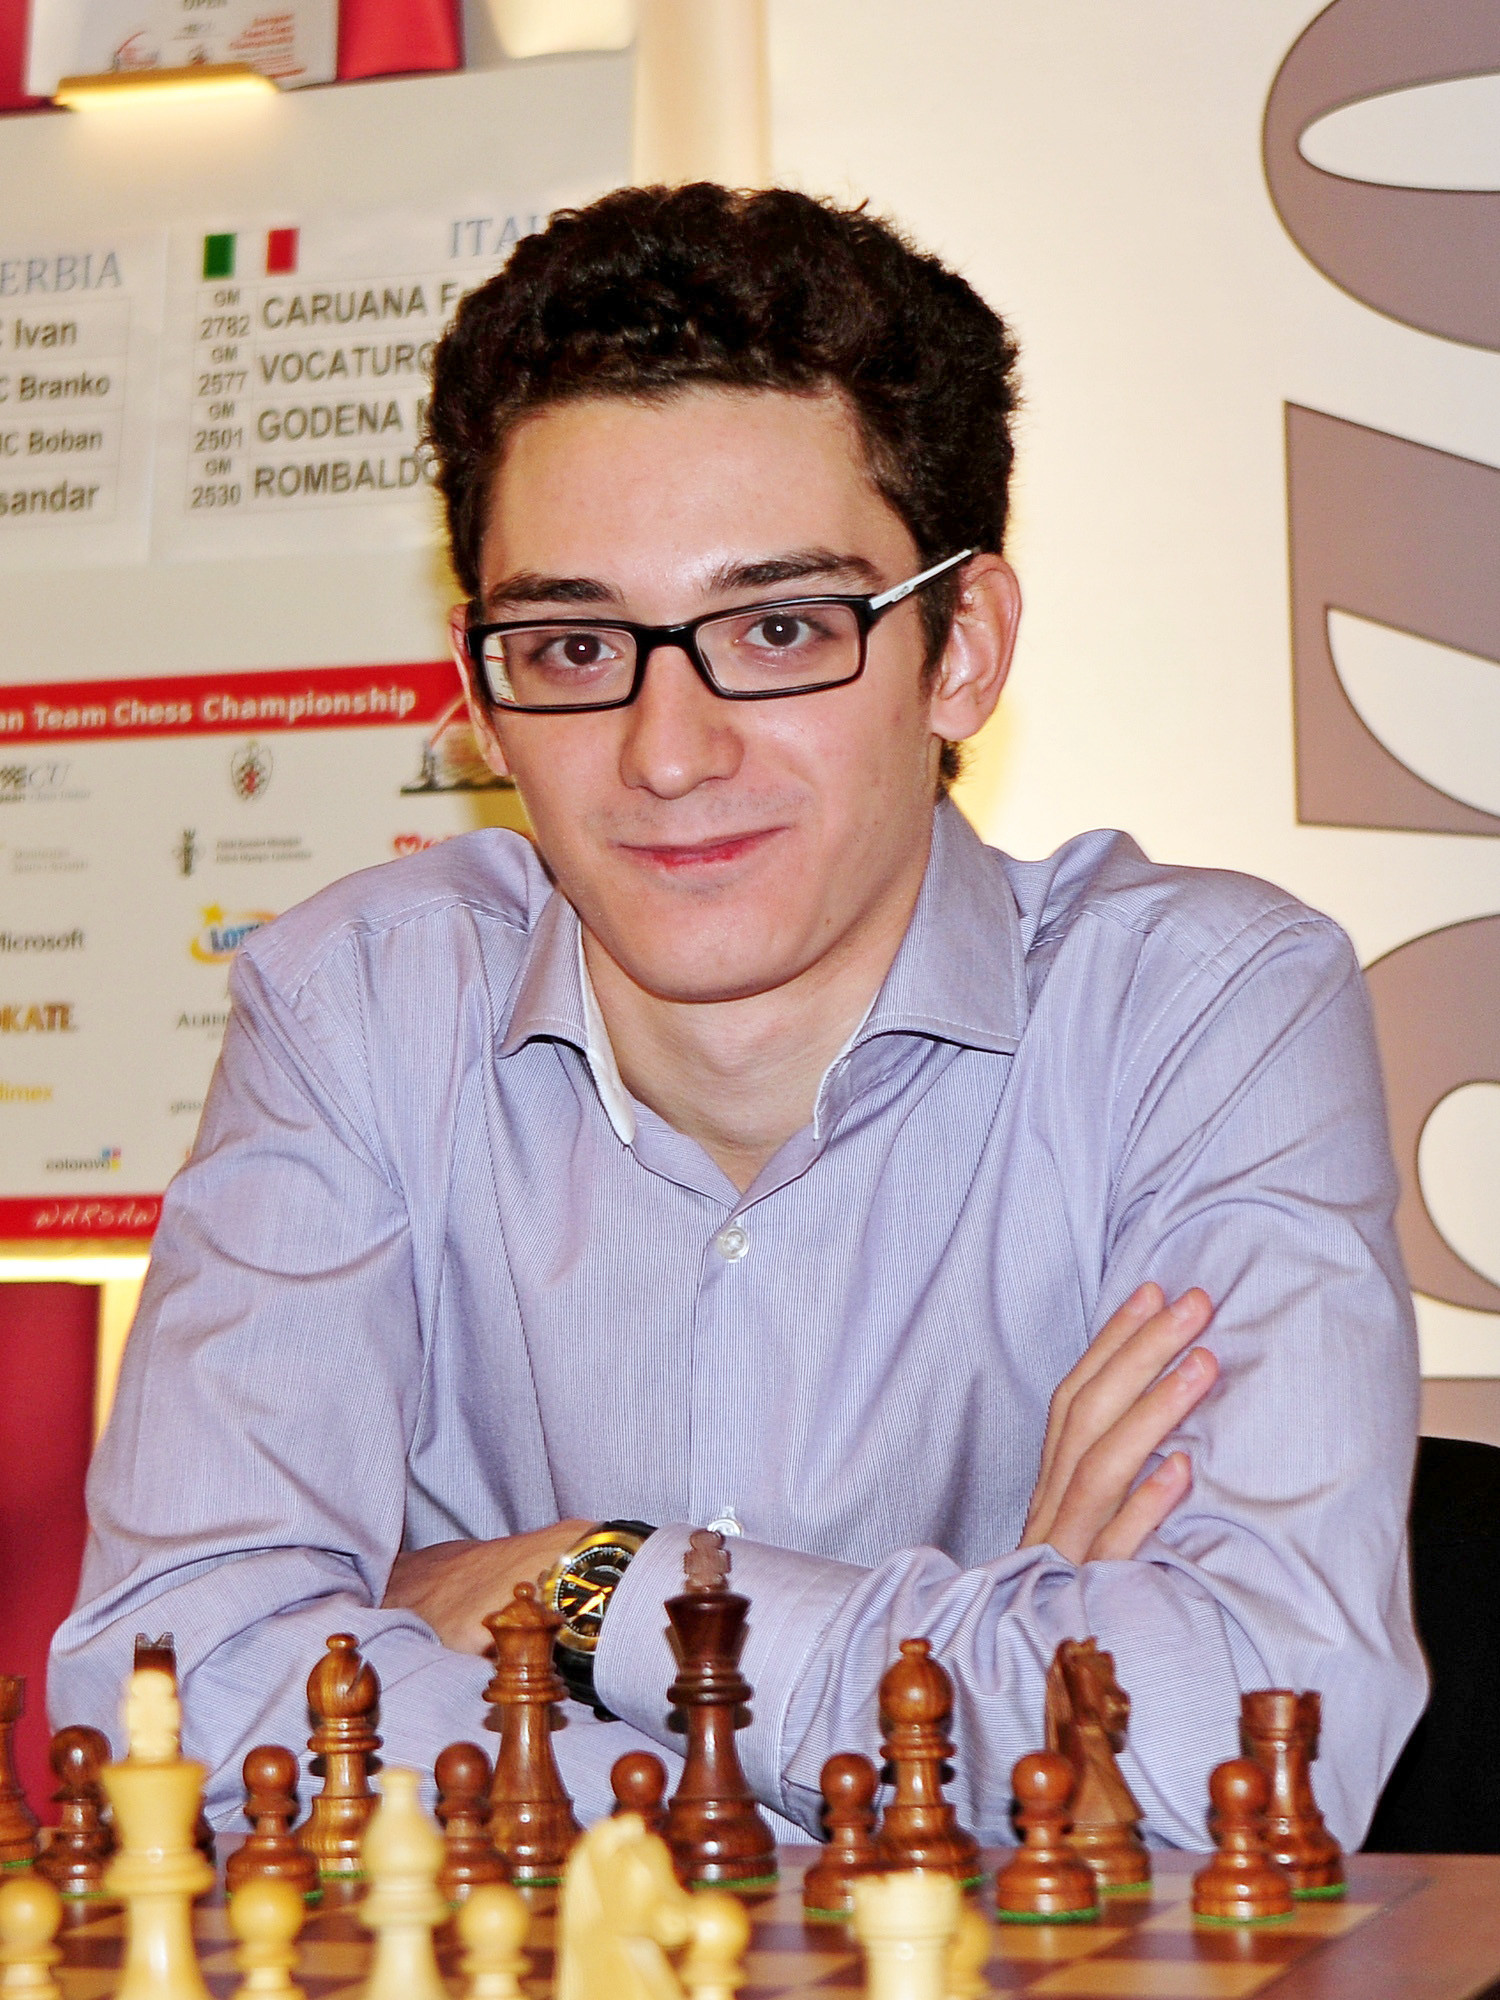 Fabiano Caruana gana el Torneo Zurich Chess Challenge 2013